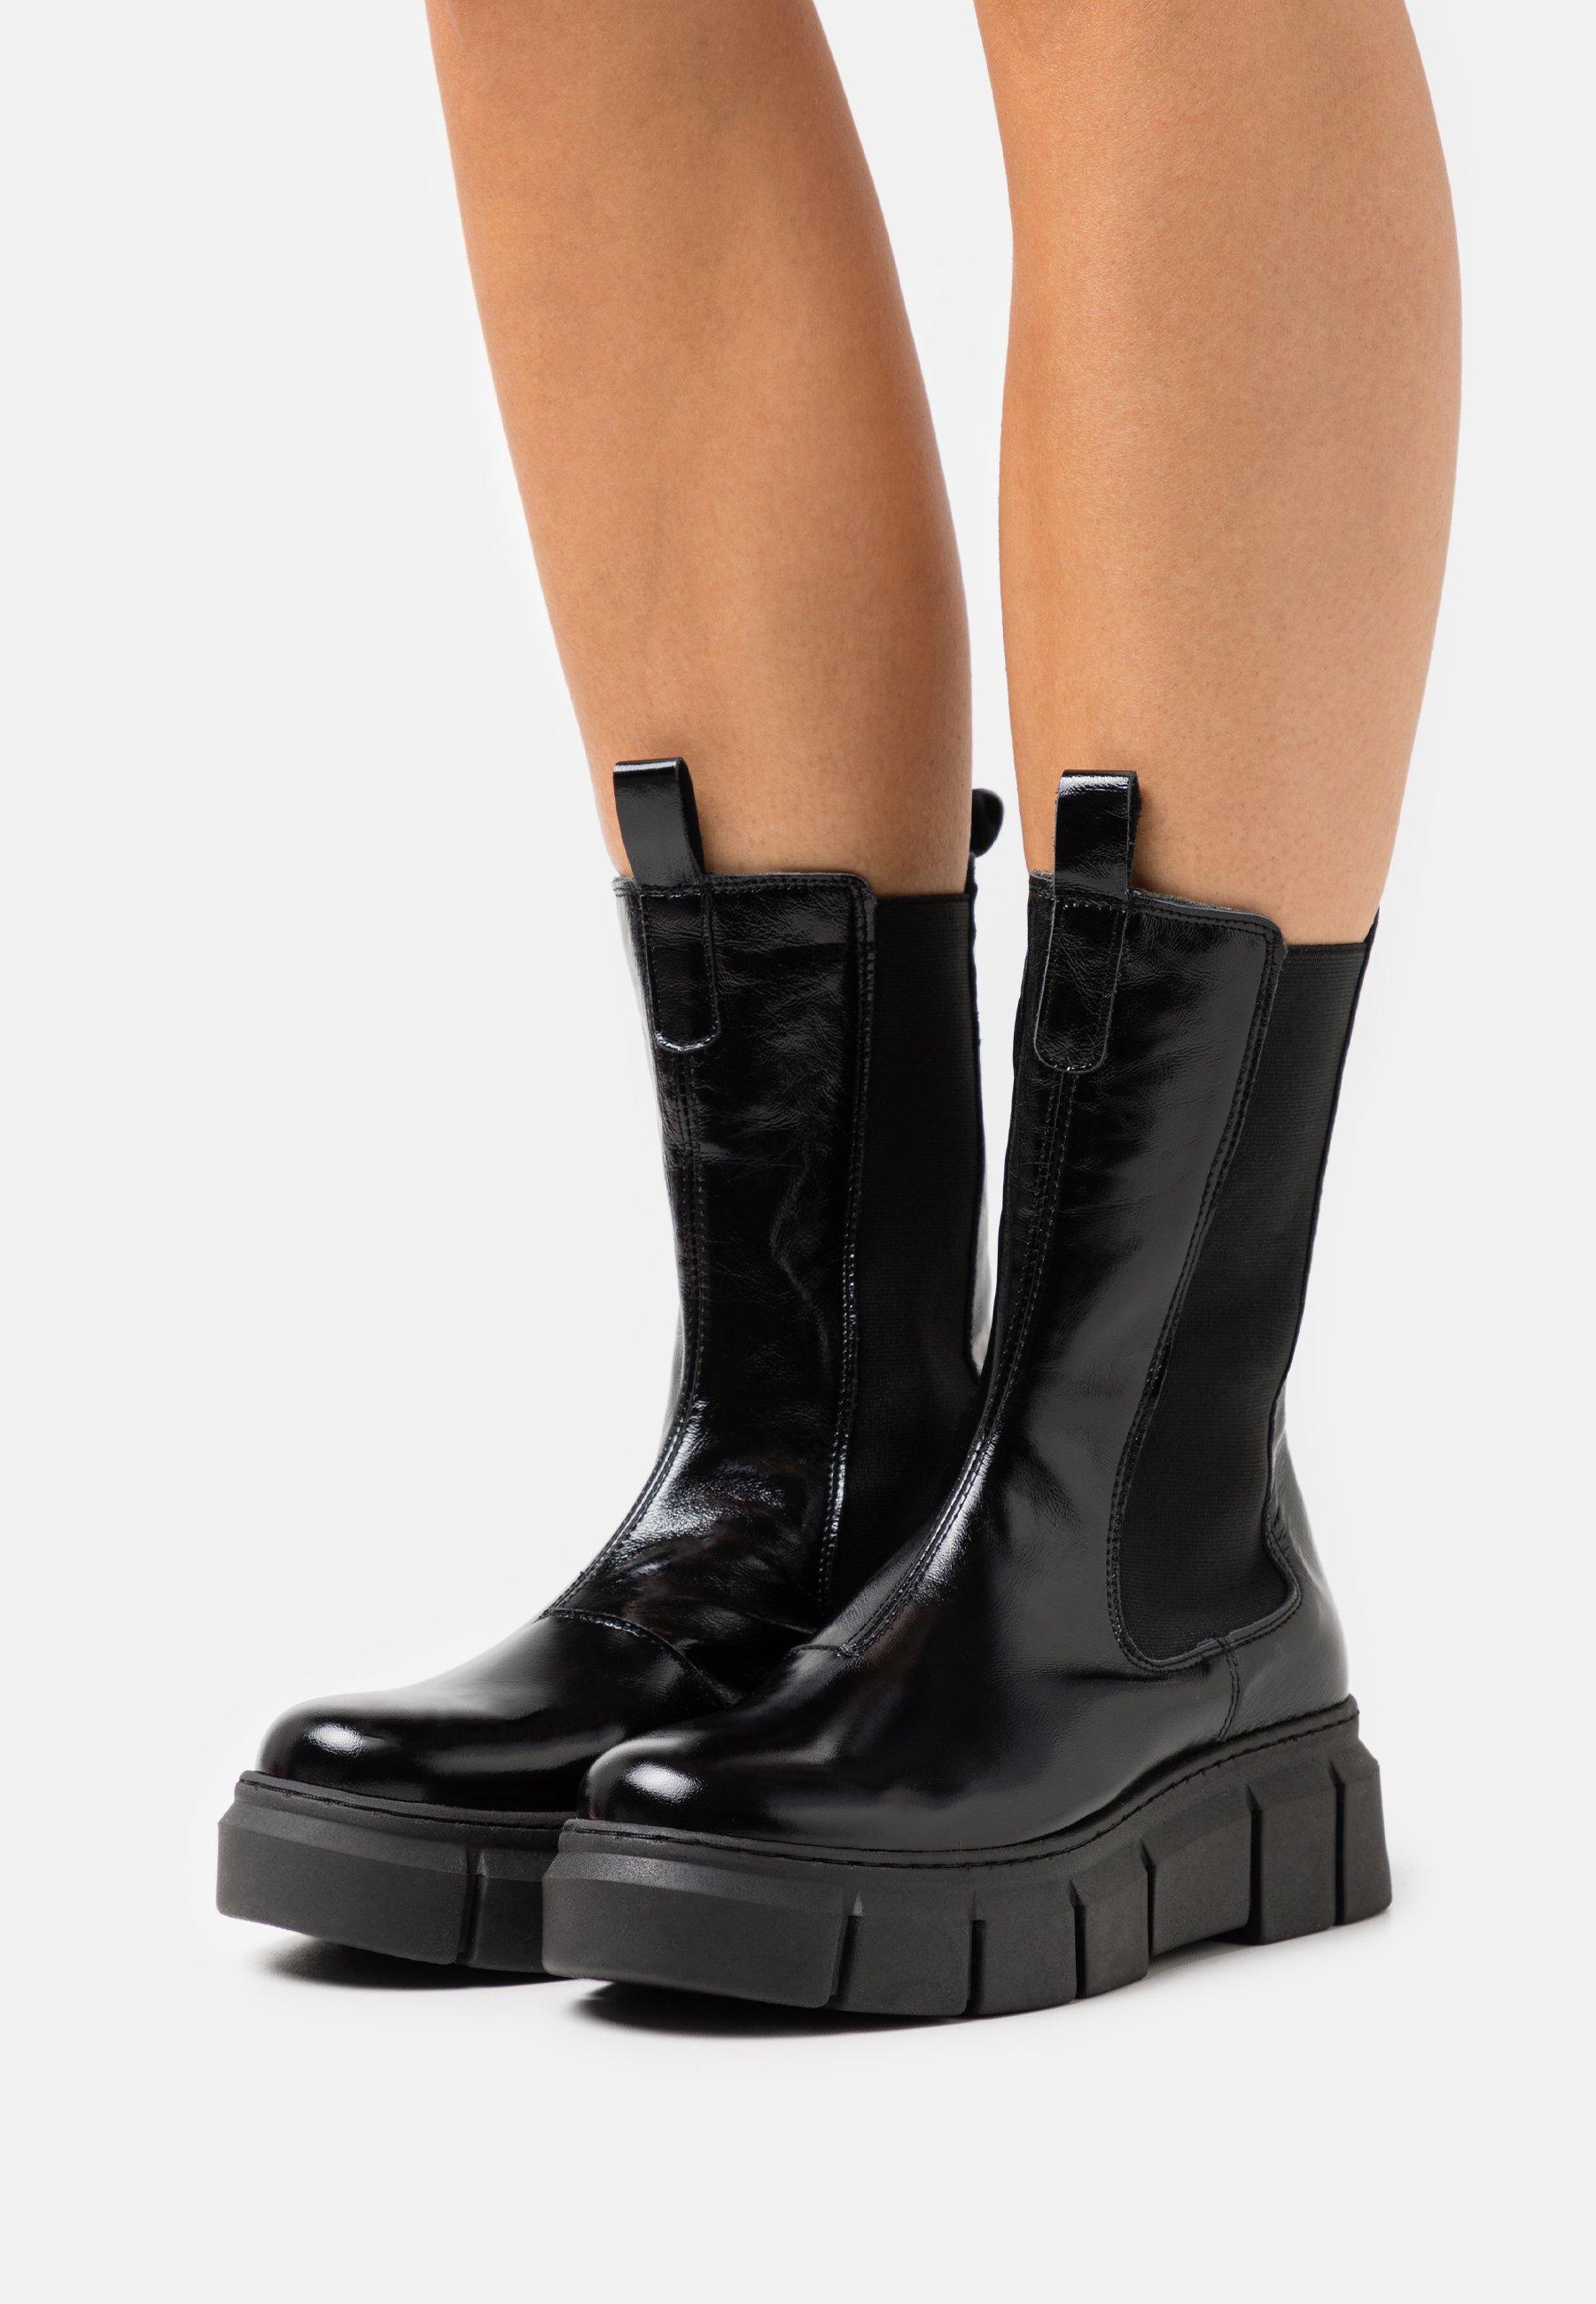 Women PICK UP - Platform boots - charol arrugado